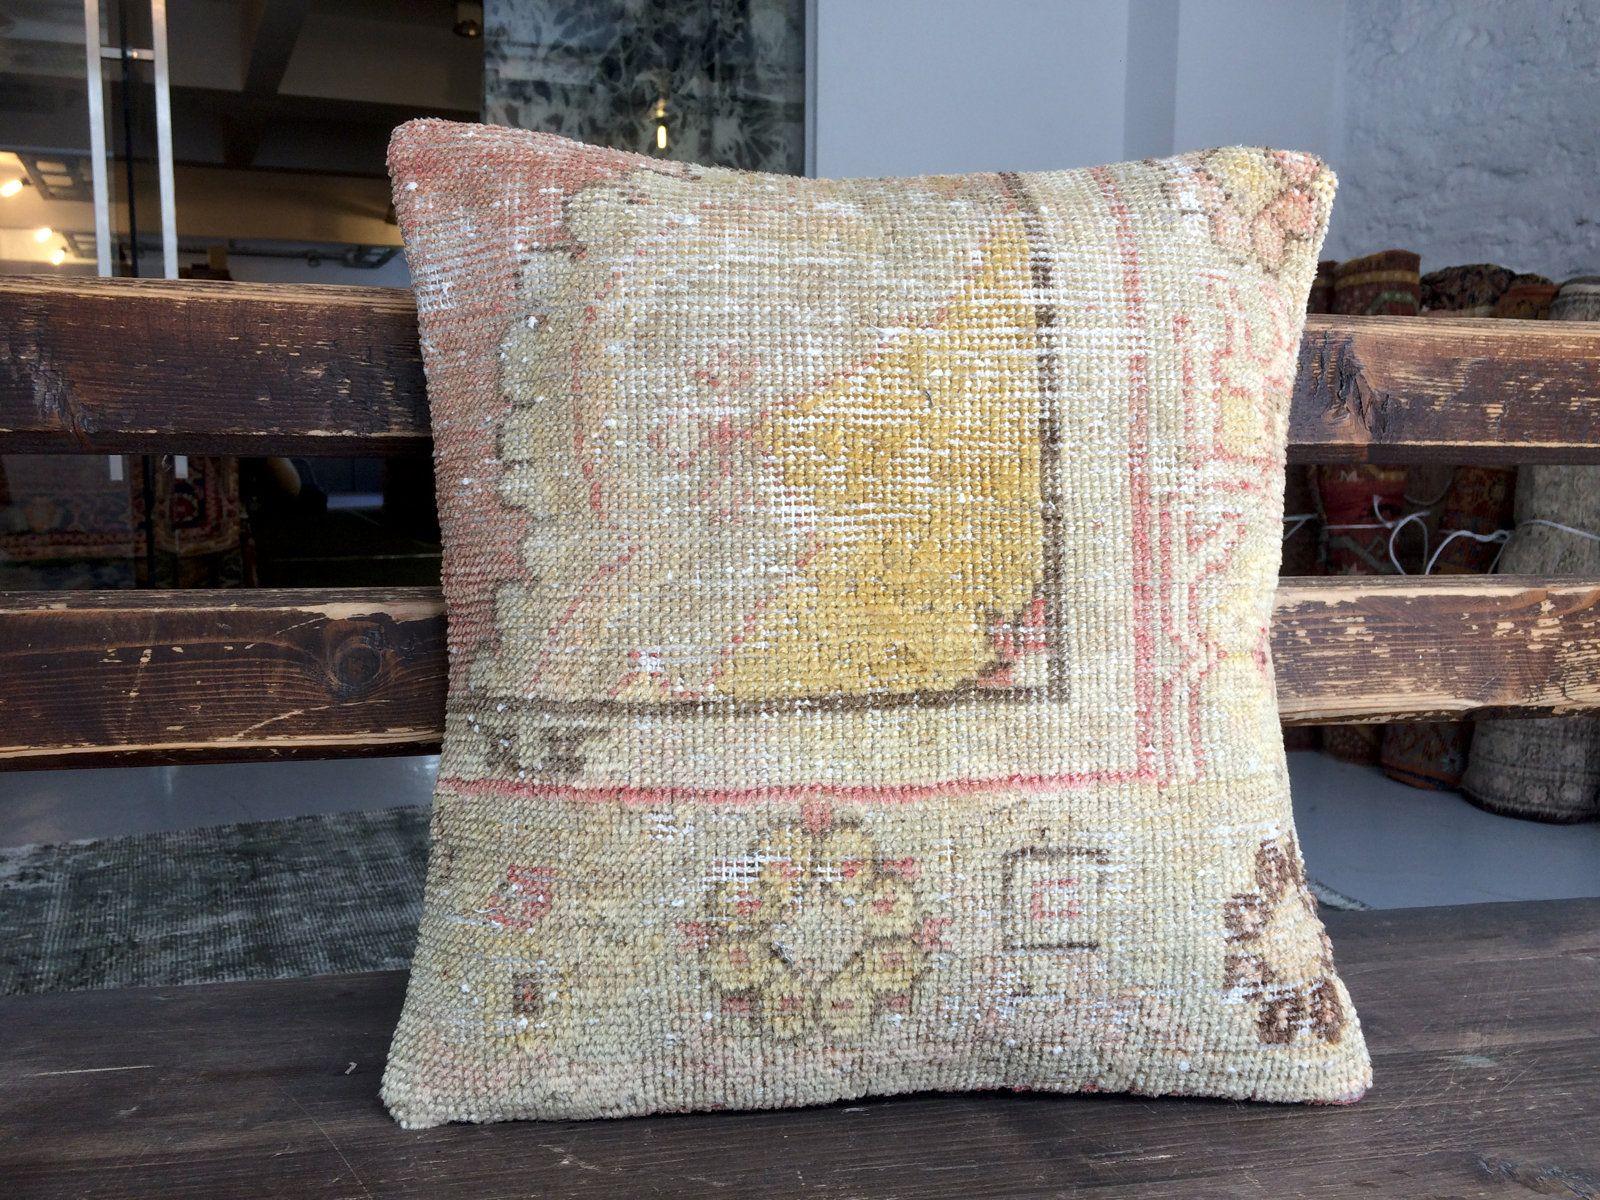 16 X16 Beige Yellow Handmade Decorative Small Sofa Pillow